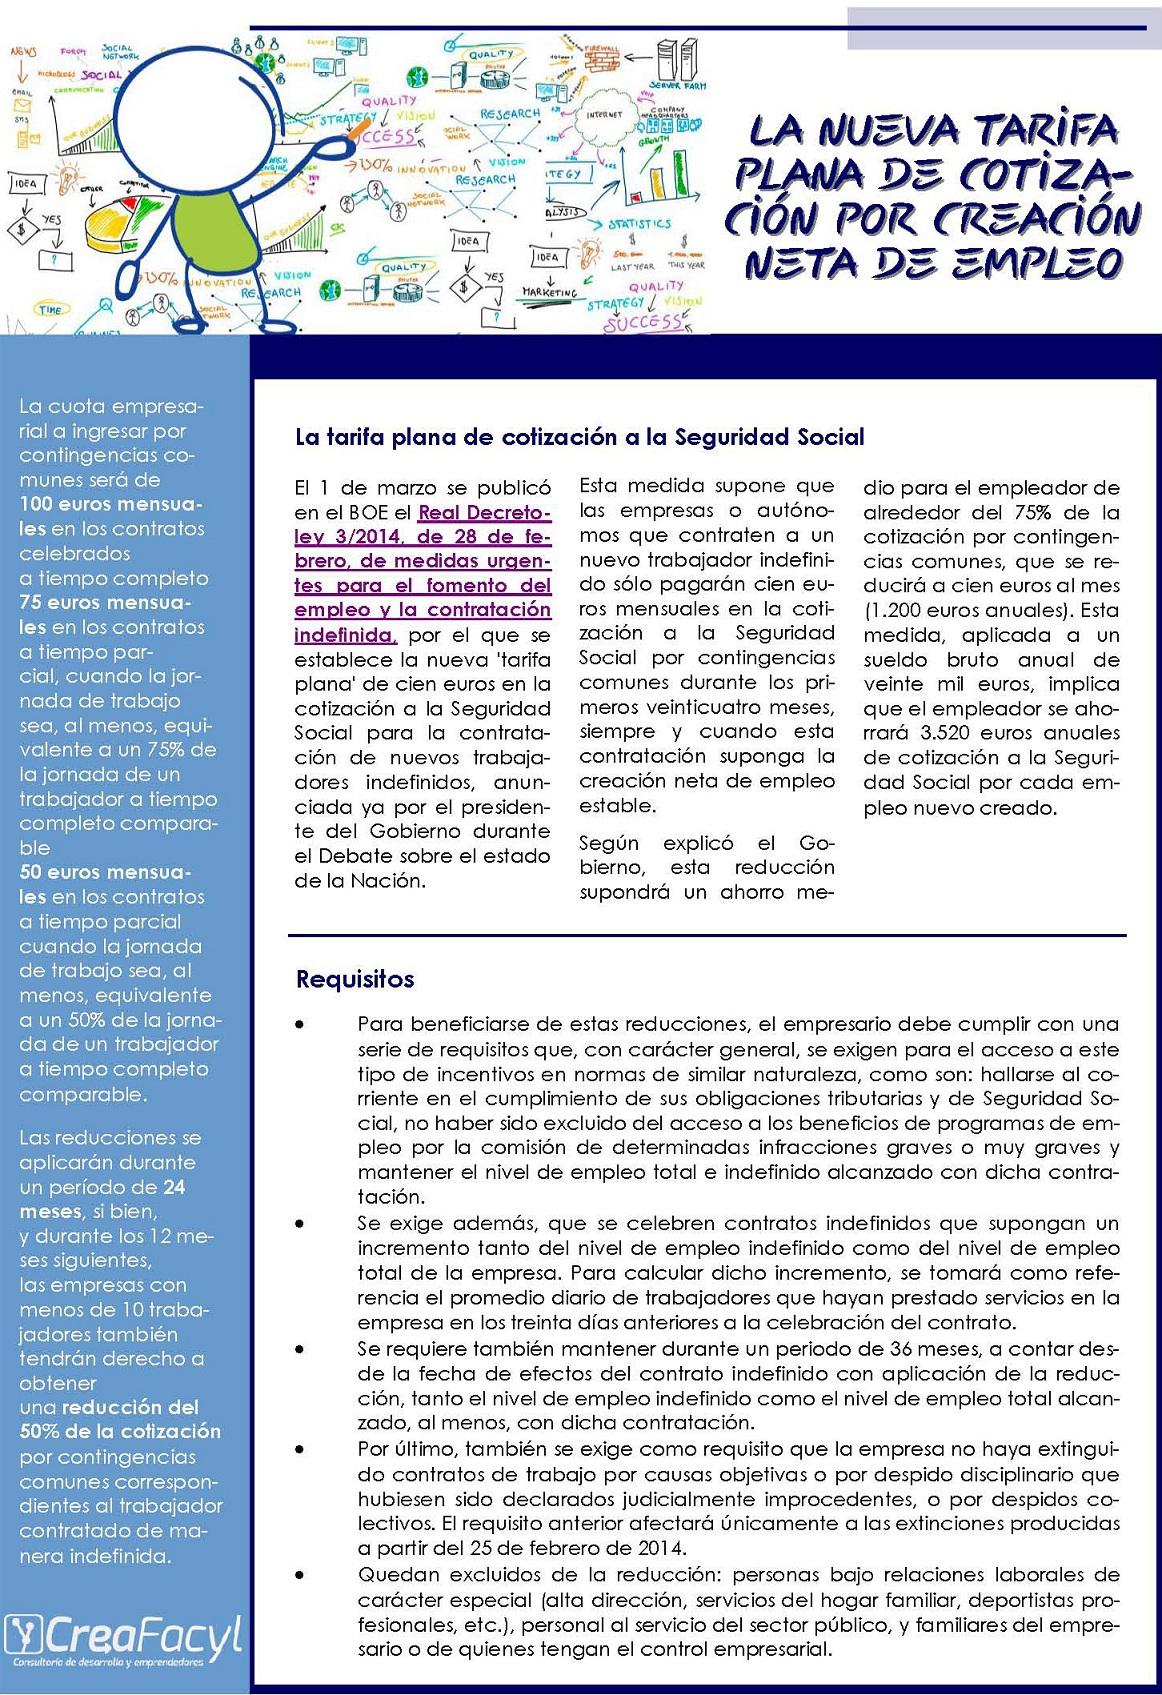 tpcss(1) Creafacyl